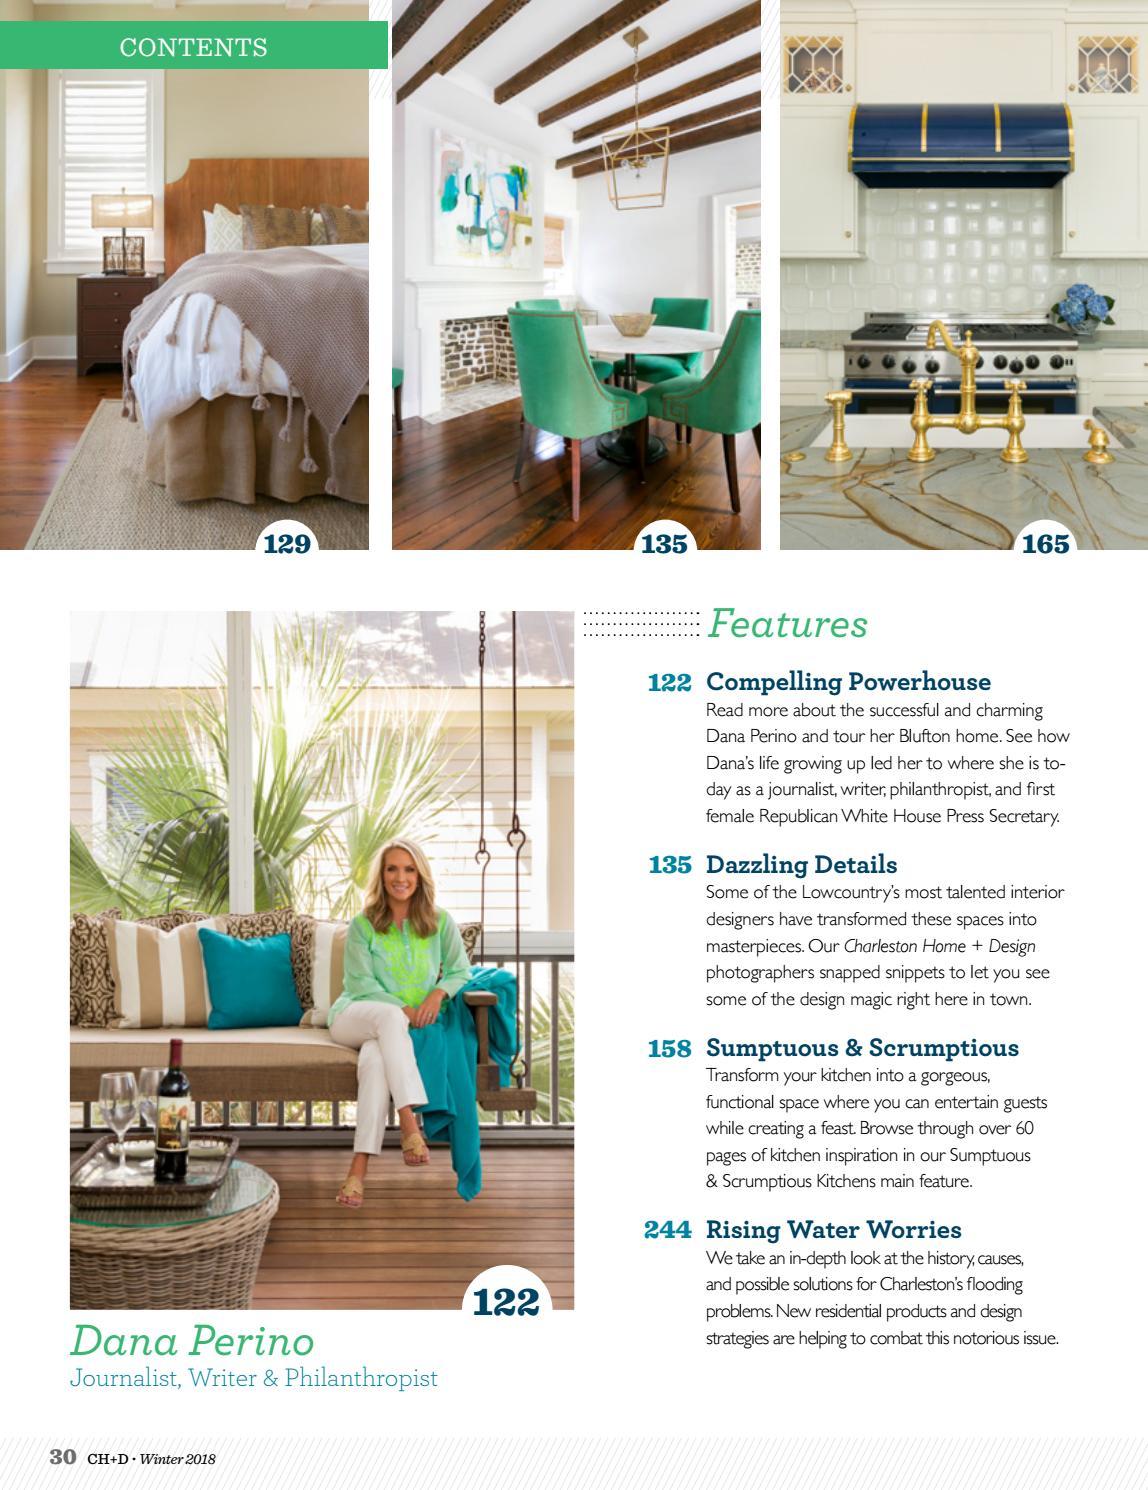 Charleston home design magazine winter 2018 by - Charleston home and design magazine ...